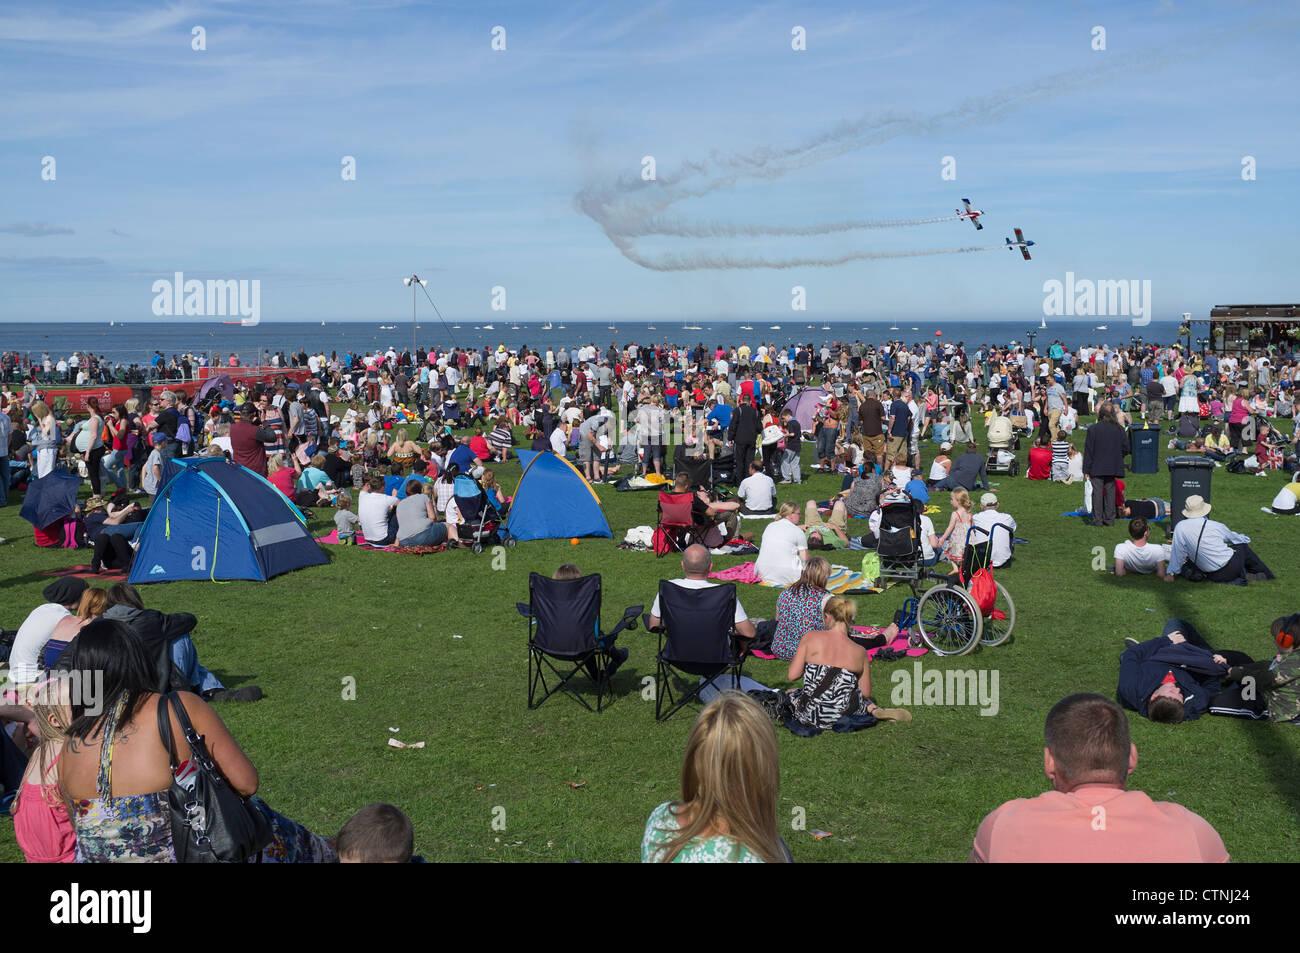 Sunderland International Airshow - Stock Image